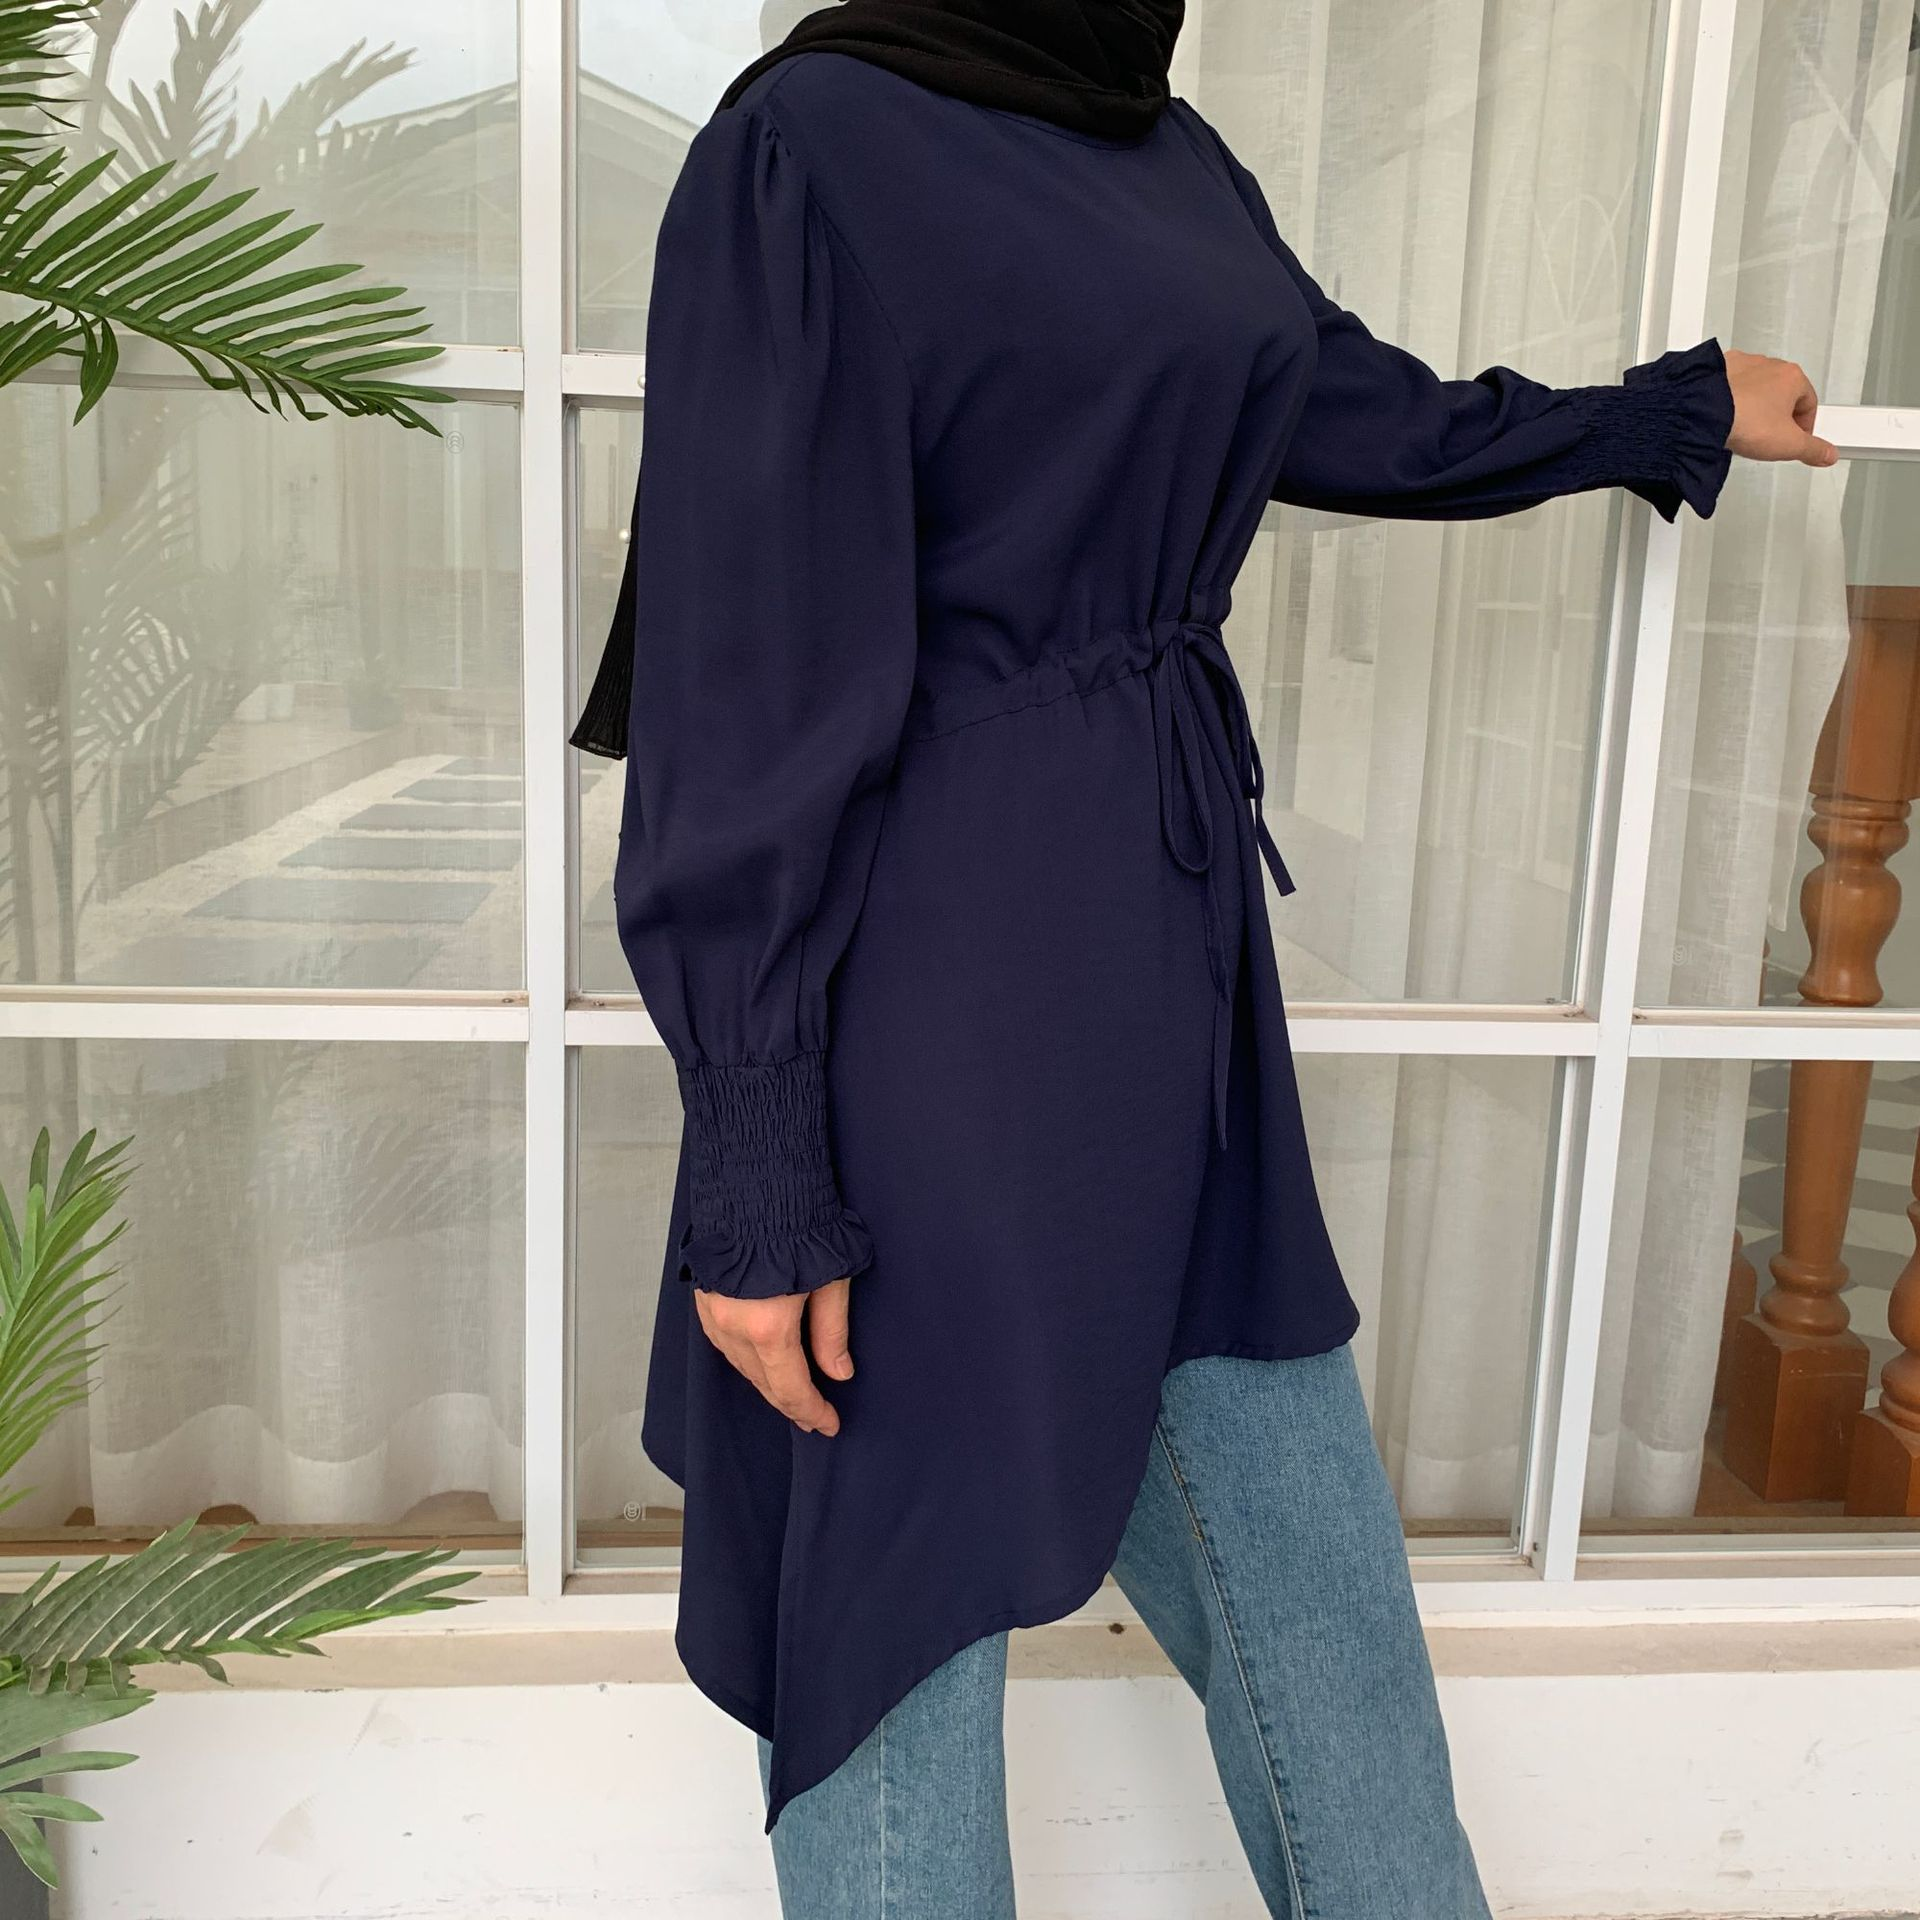 5XL Fashion irregular mulsim tops peignoir pure color plus size tops female elastic waist Worship Service islamic shirt F1668